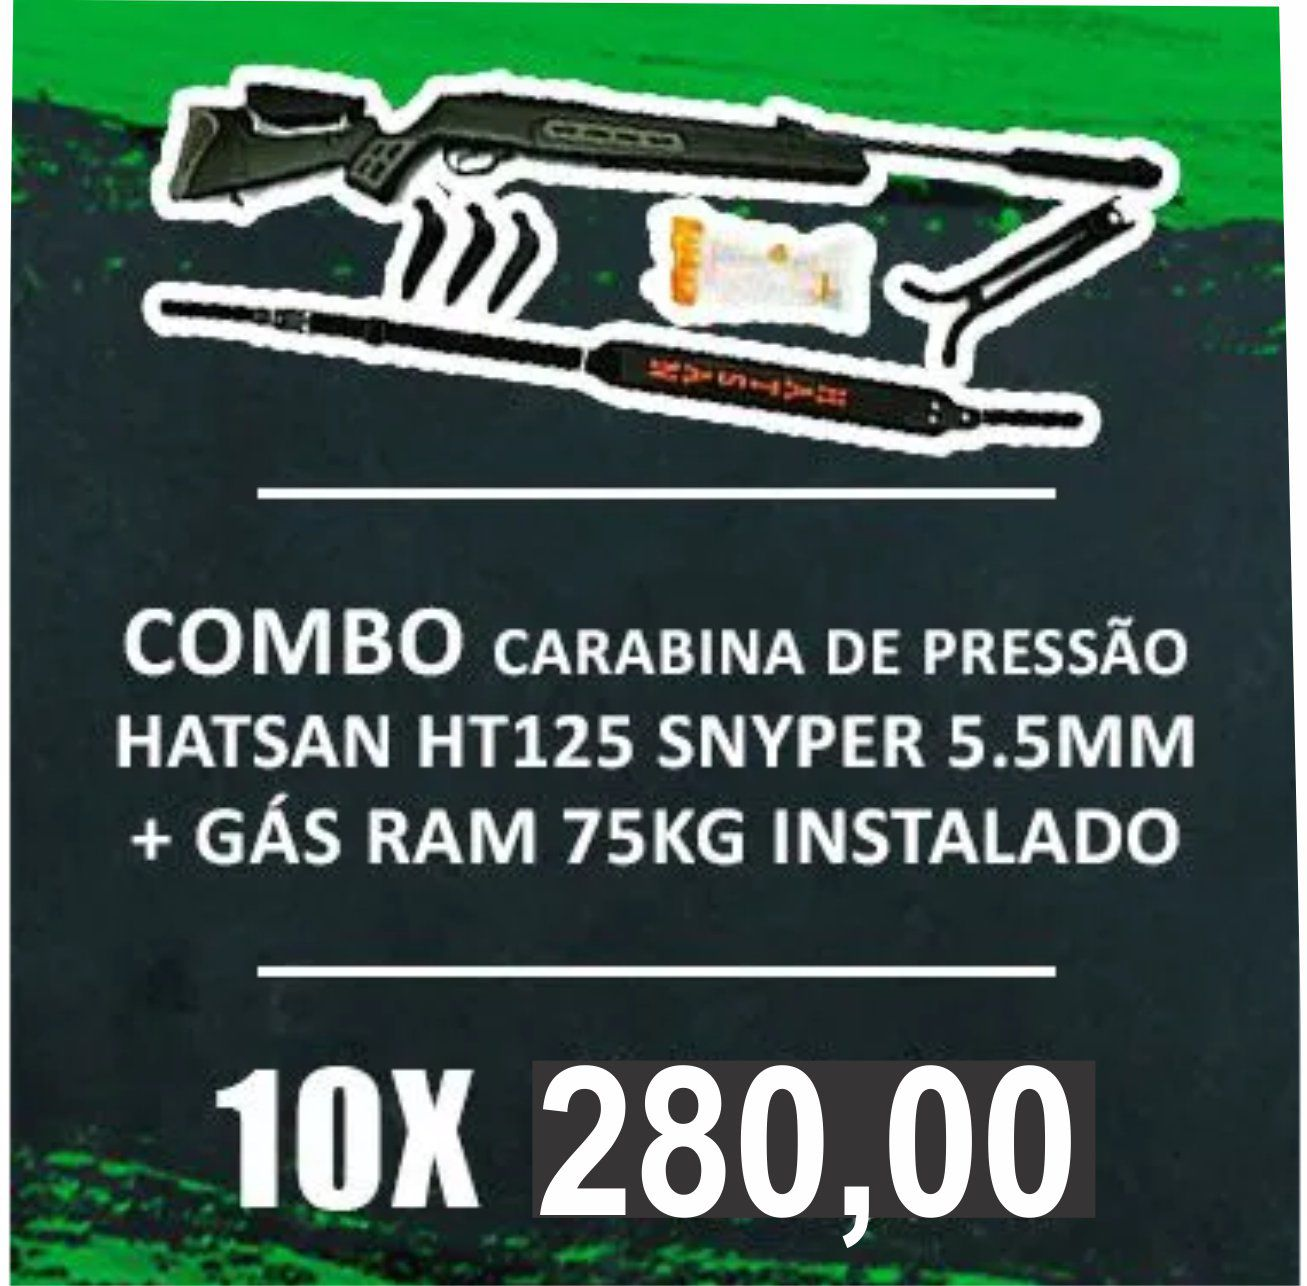 Consórcio - Carabina Hatsan HT125 SNYPER 5.5mm + Gás ram 75kg Instalado